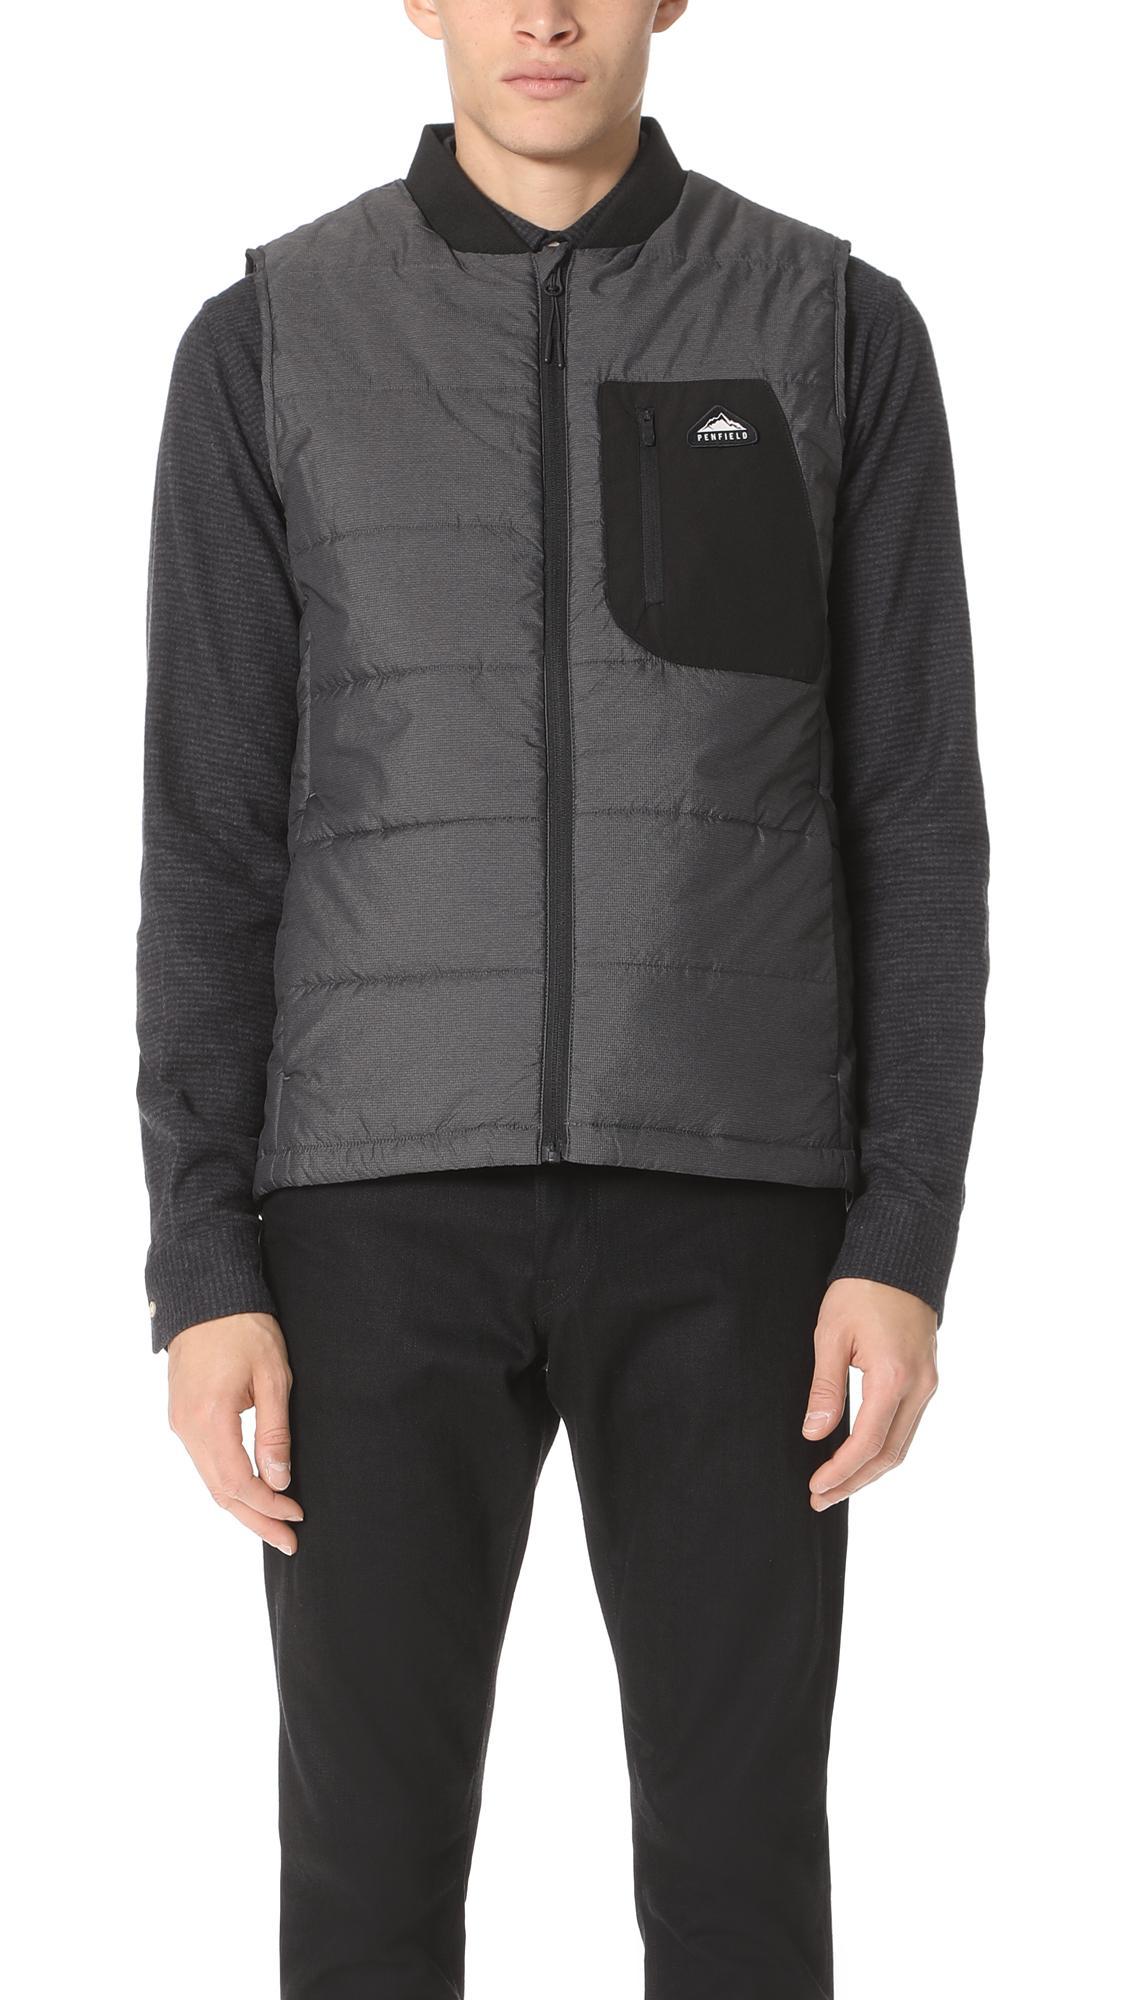 Penfield Foley Vest In Black